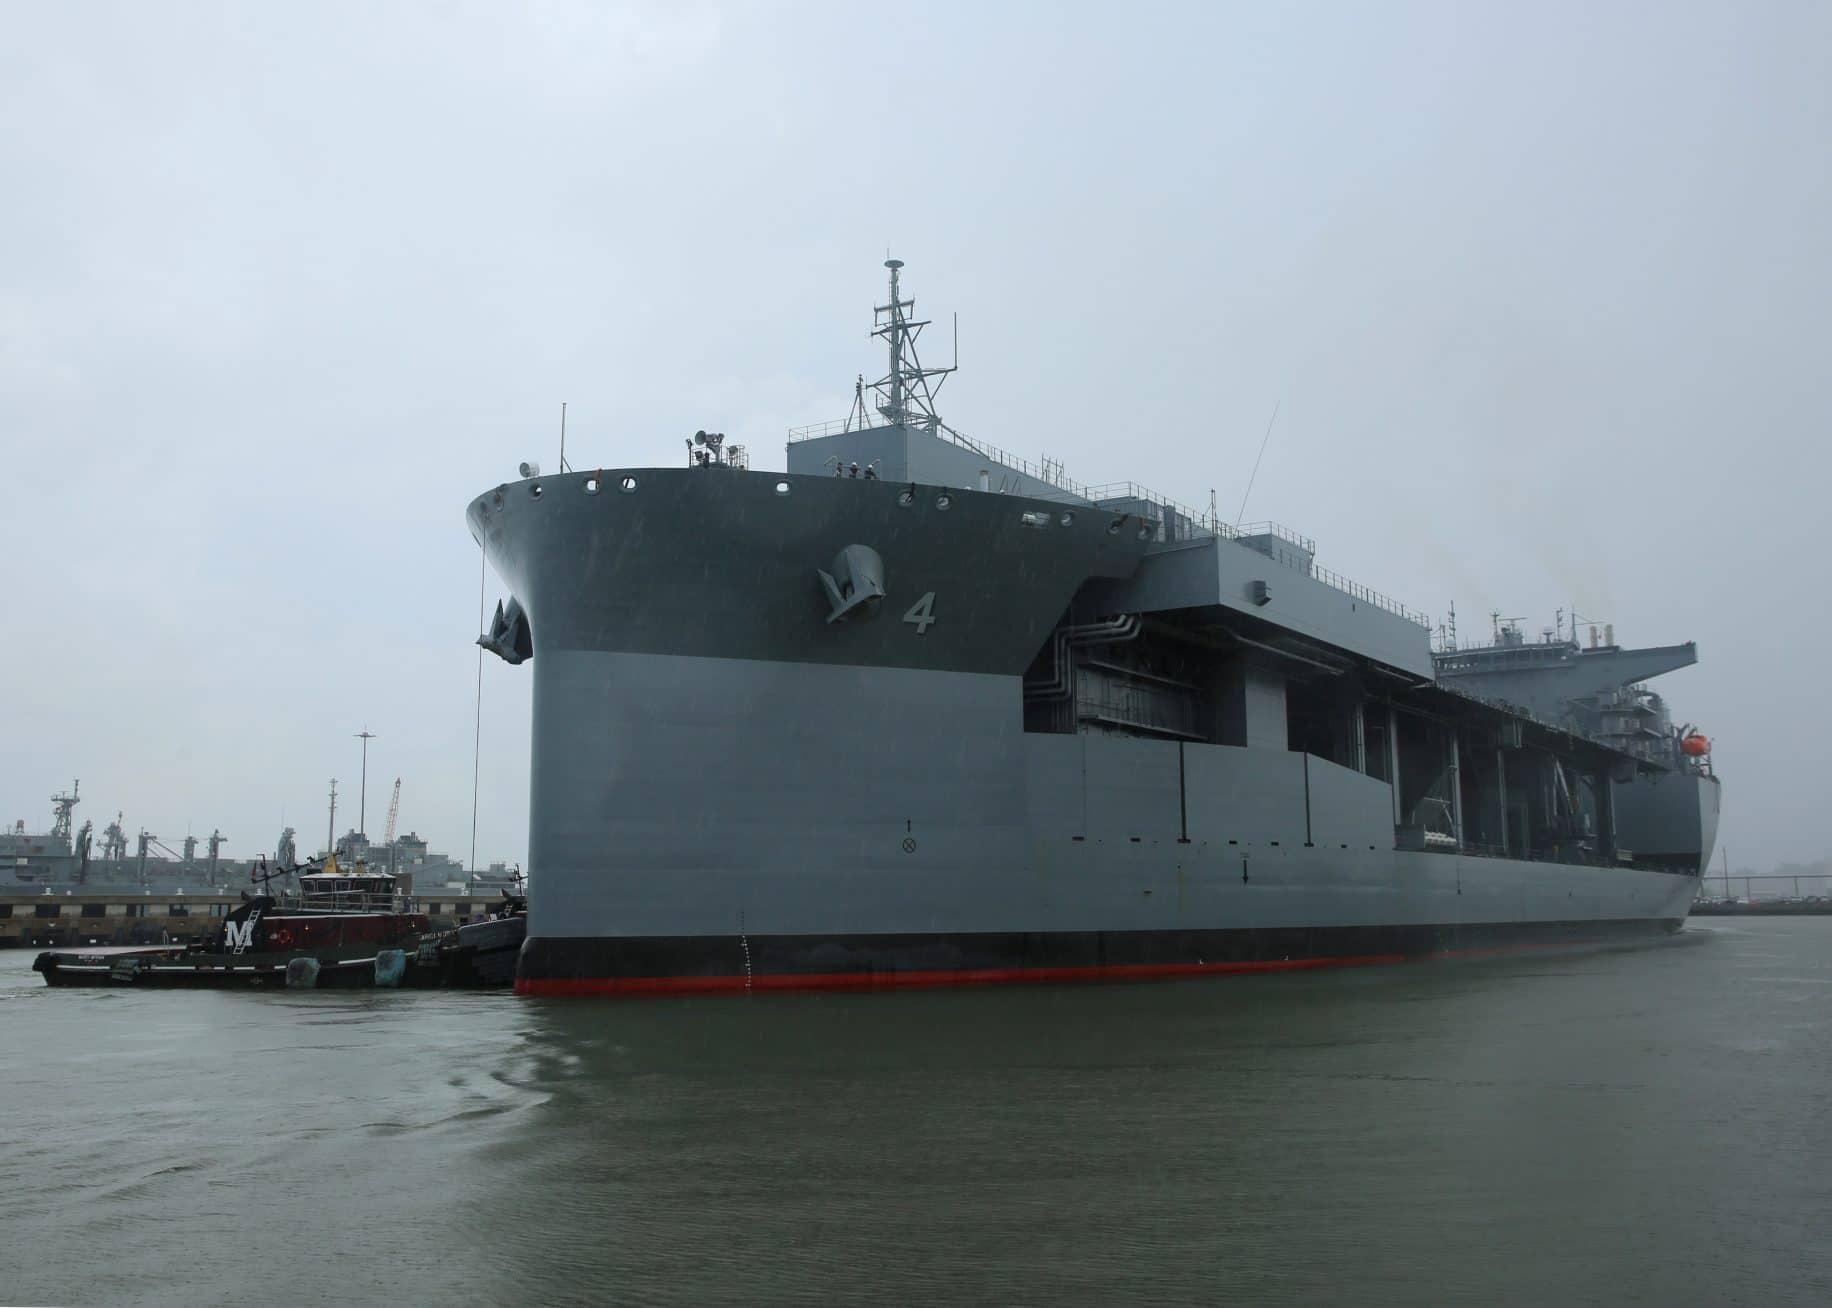 americanmilitarynews.com on Flipboard: Navy to commission ...